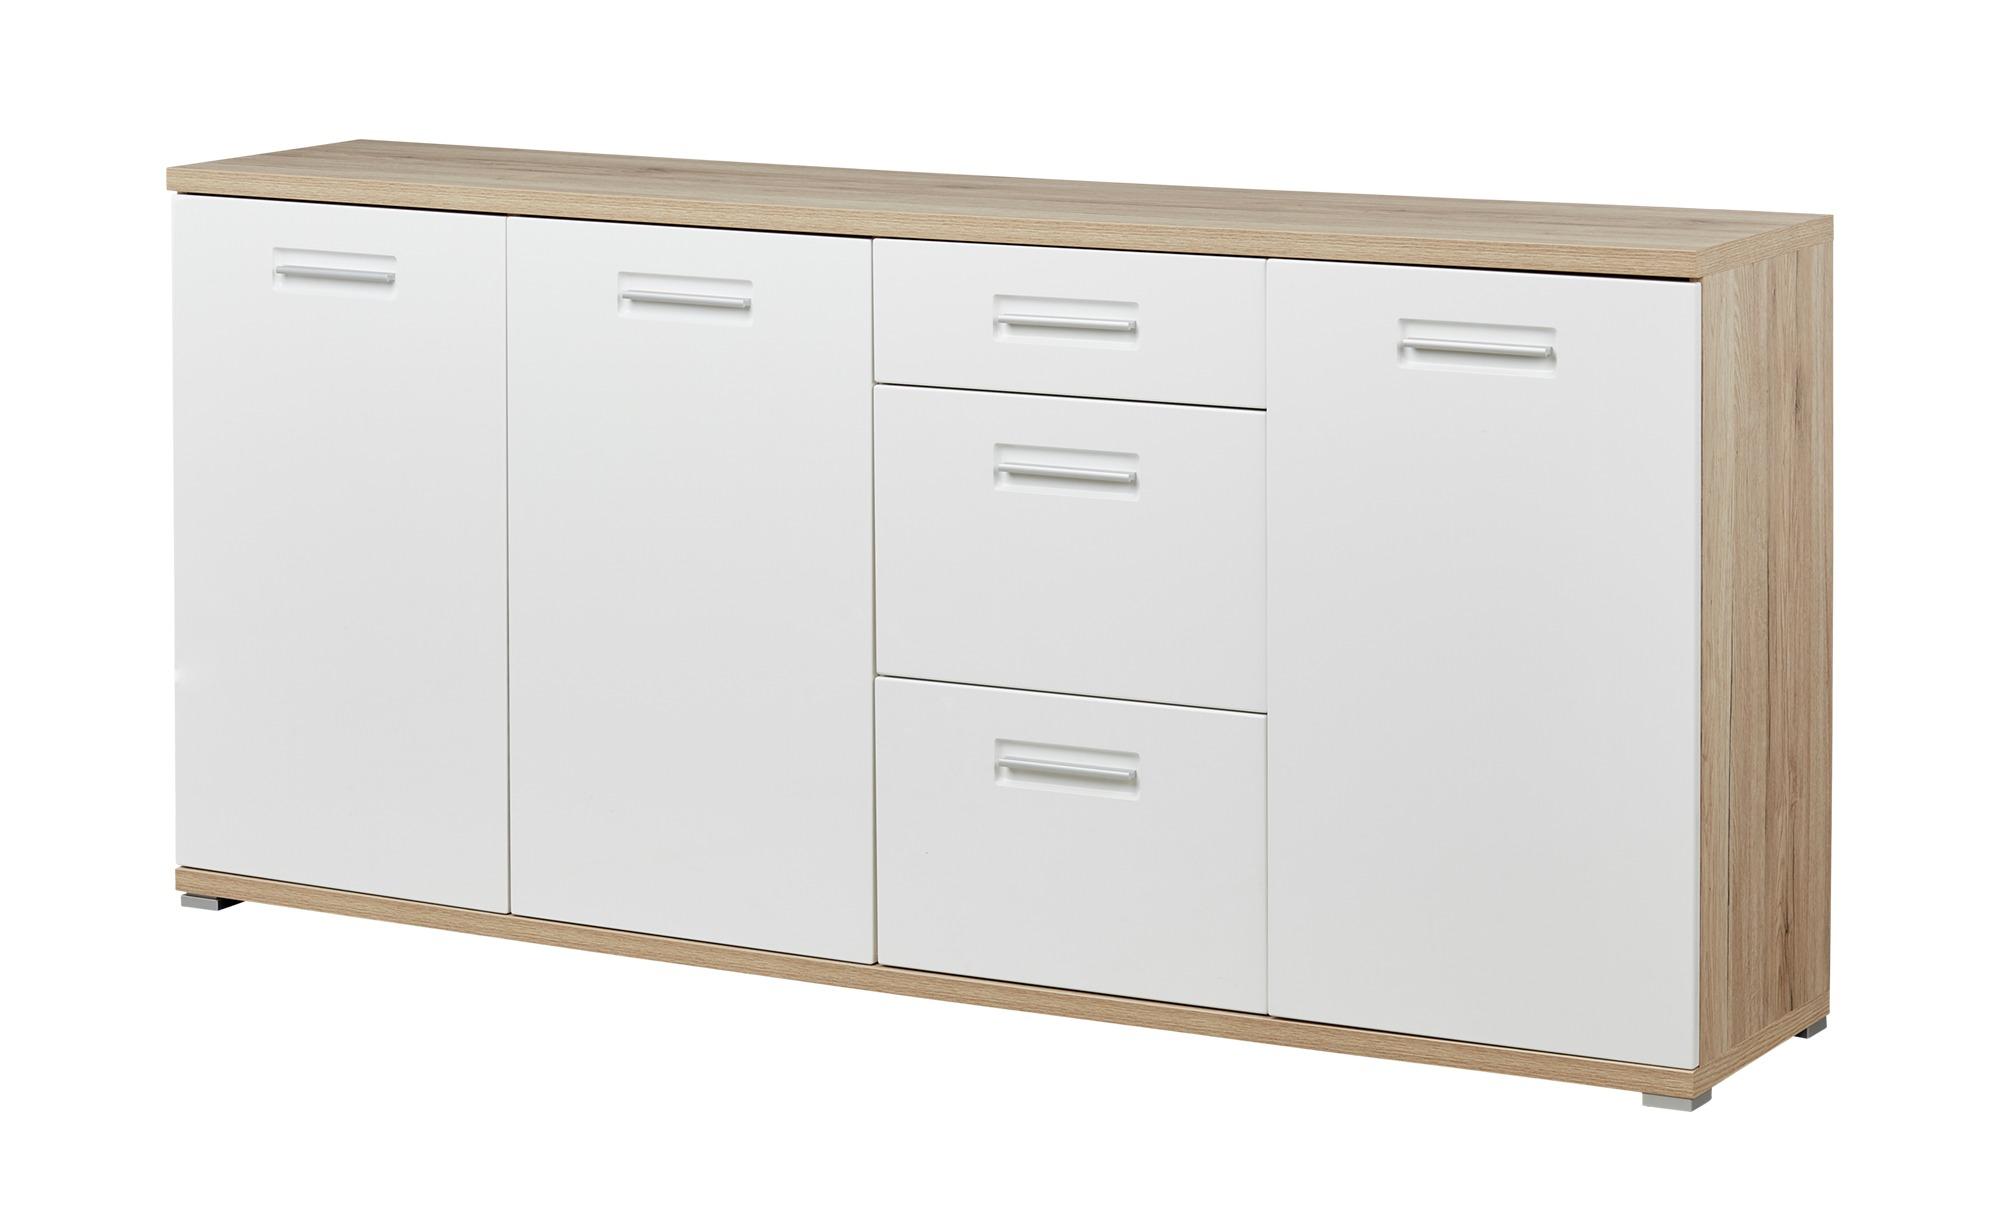 uno Sideboard  TYBAL ¦ holzfarben ¦ Maße (cm): B: 192 H: 88 T: 40 Kommoden & Sideboards > Kommoden - Höffner